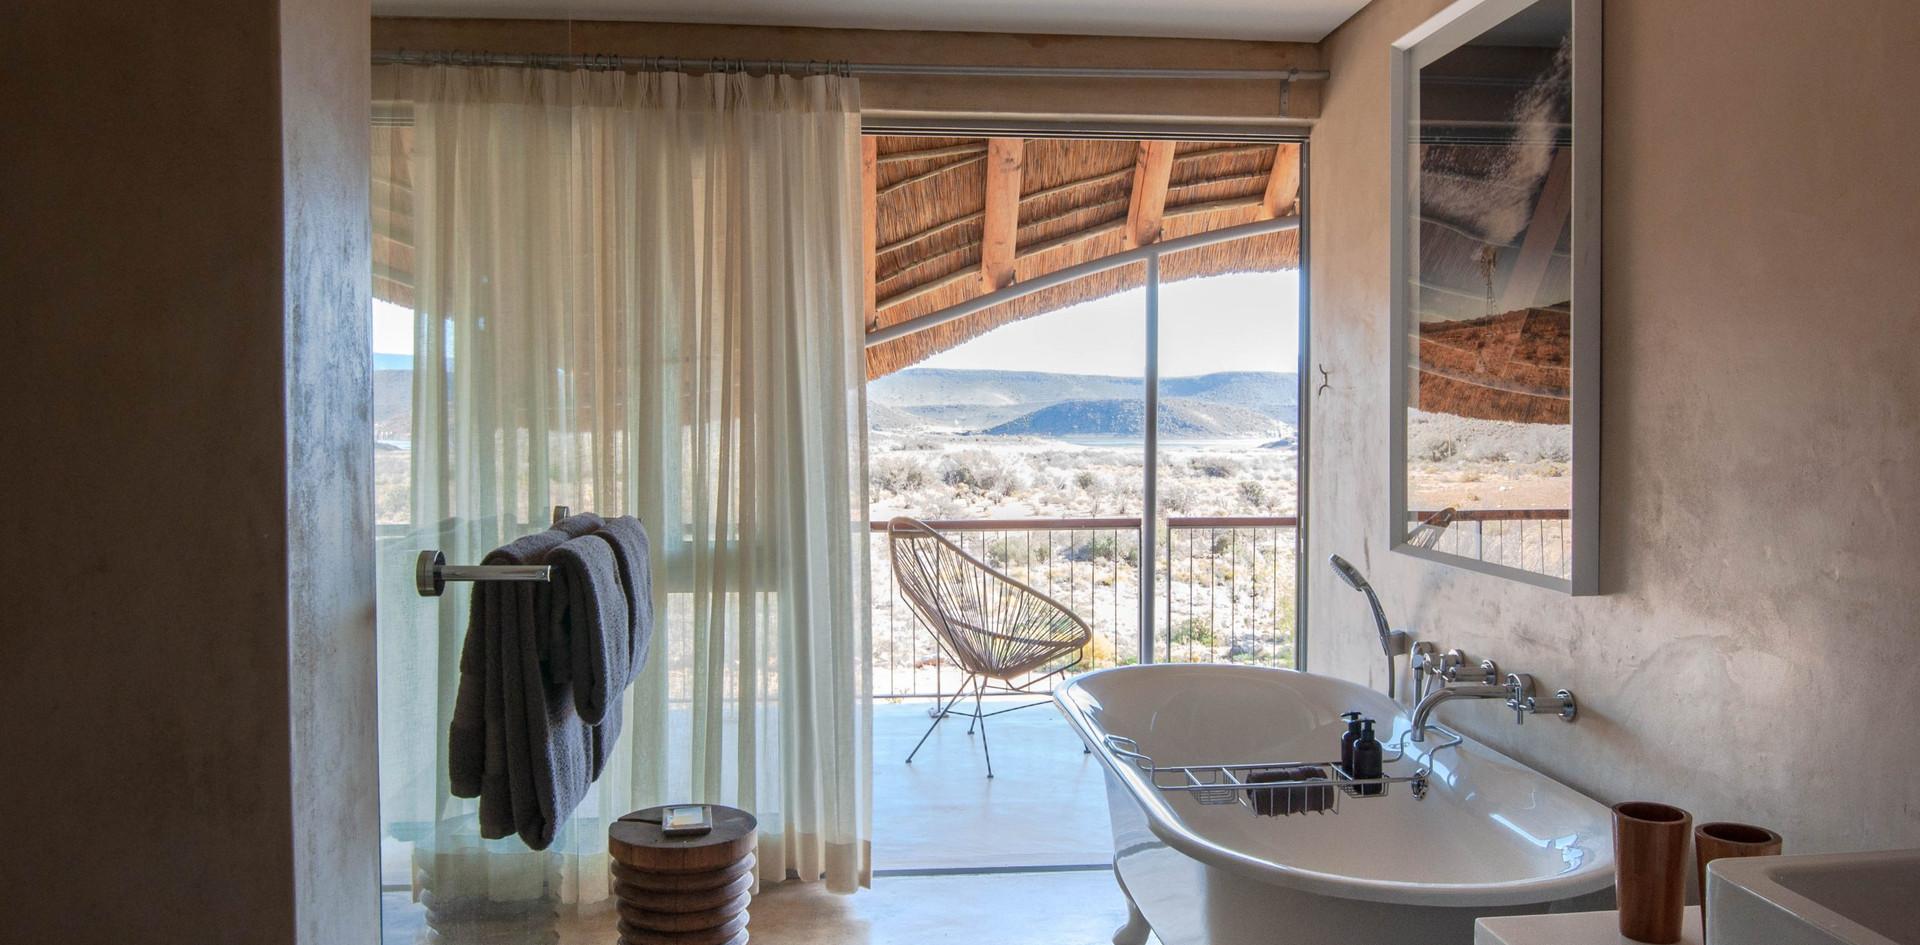 Gondwana-Family-Lodge-Bathroom-scaled.jp